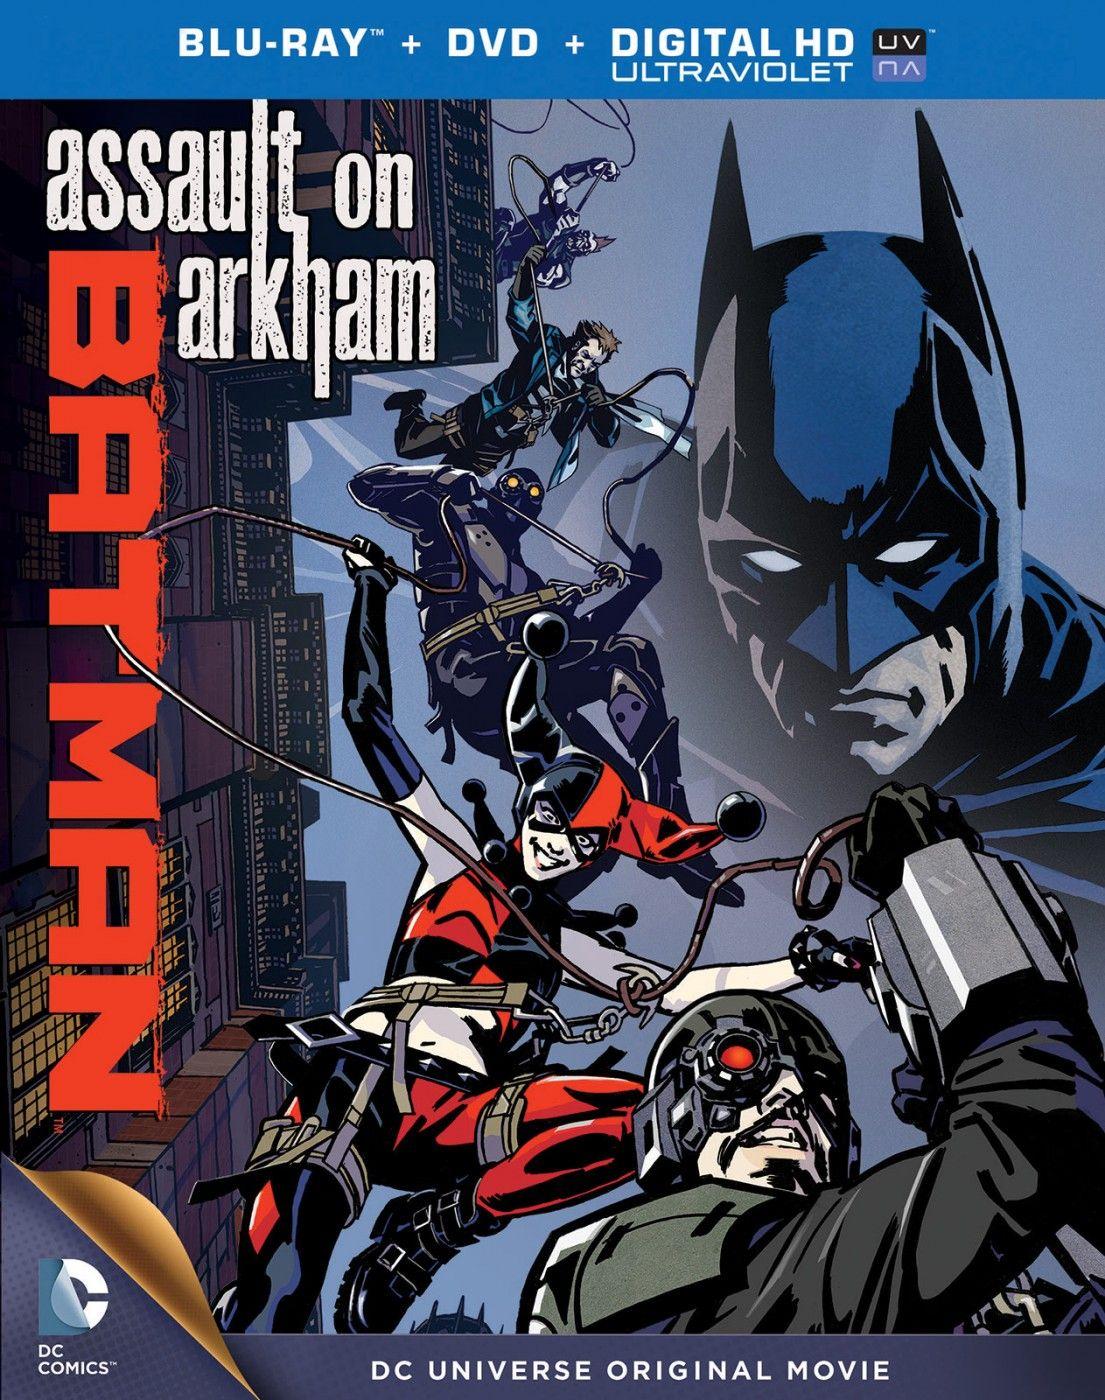 Batman assault on arkham language english genre